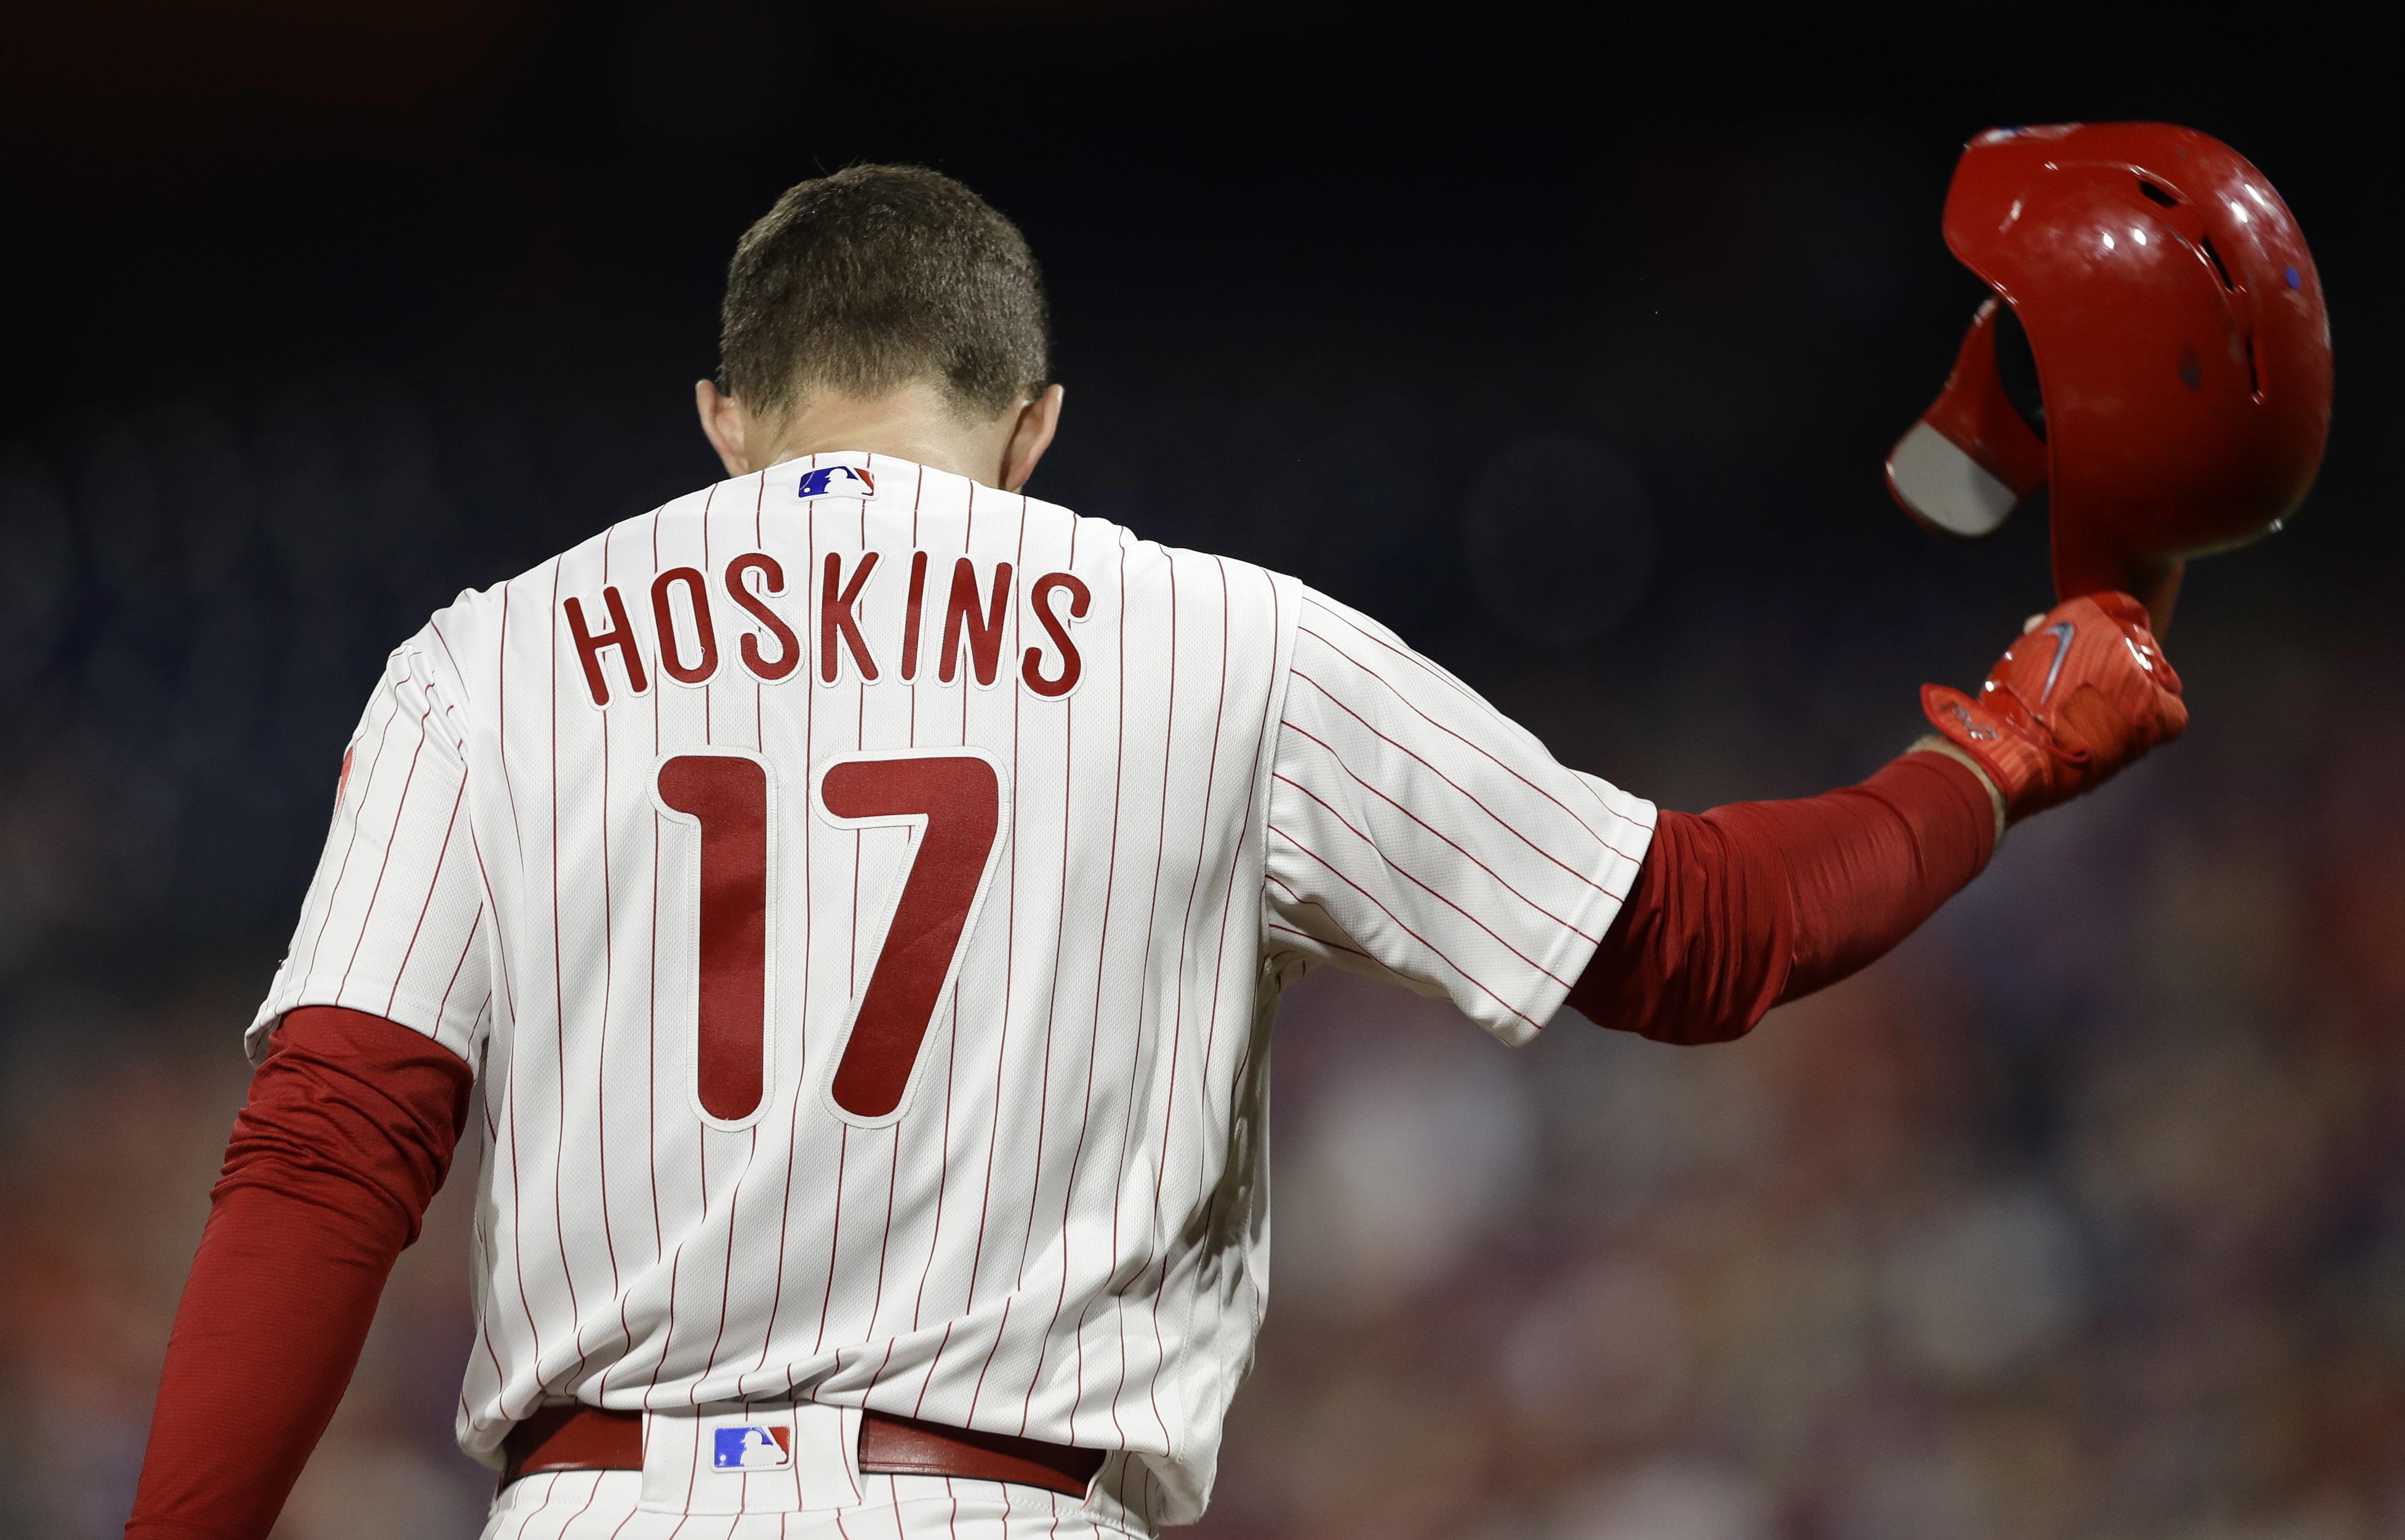 Philadelphia Phillies´ Rhys Hoskins tosses his helmet after pop-fouling out against Washington Nationals starting pitcher Stephen Strasburg during the fifth inning of a baseball game, Wednesday, Sept. 12, 2018, in Philadelphia. Washington won 5-1. (AP Photo/Matt Slocum)